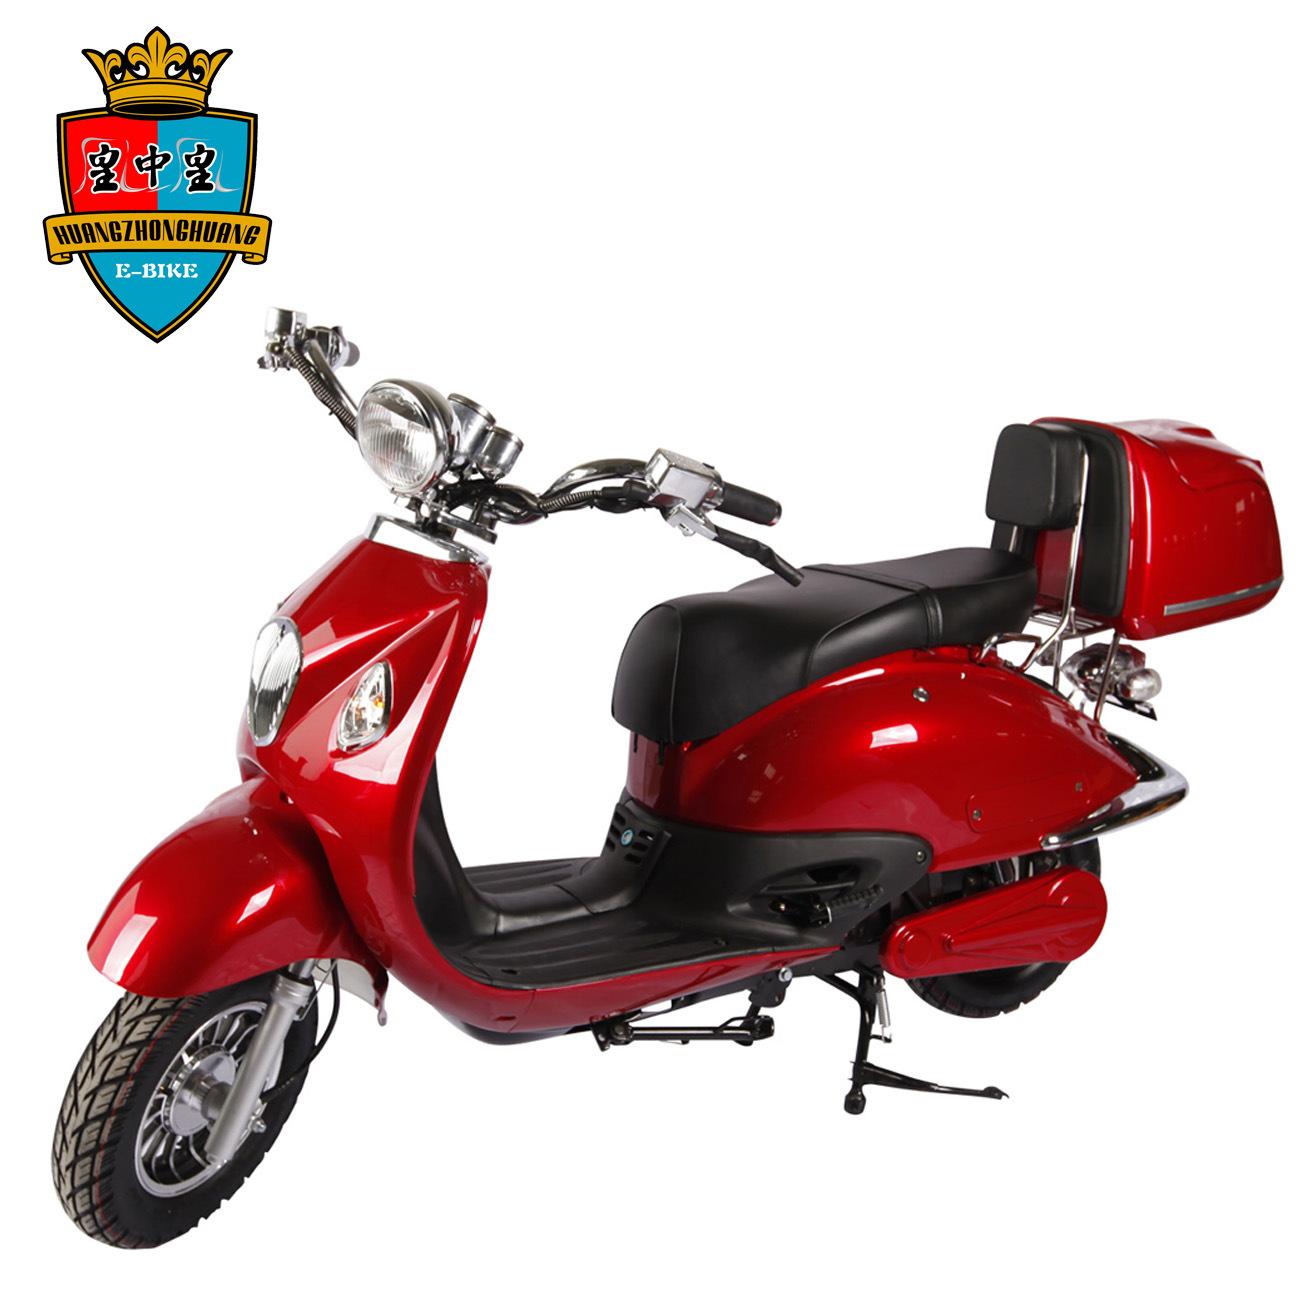 1500W Motor 72W 20ah Lead Acid / Lithium Battery Electric Motorcycle